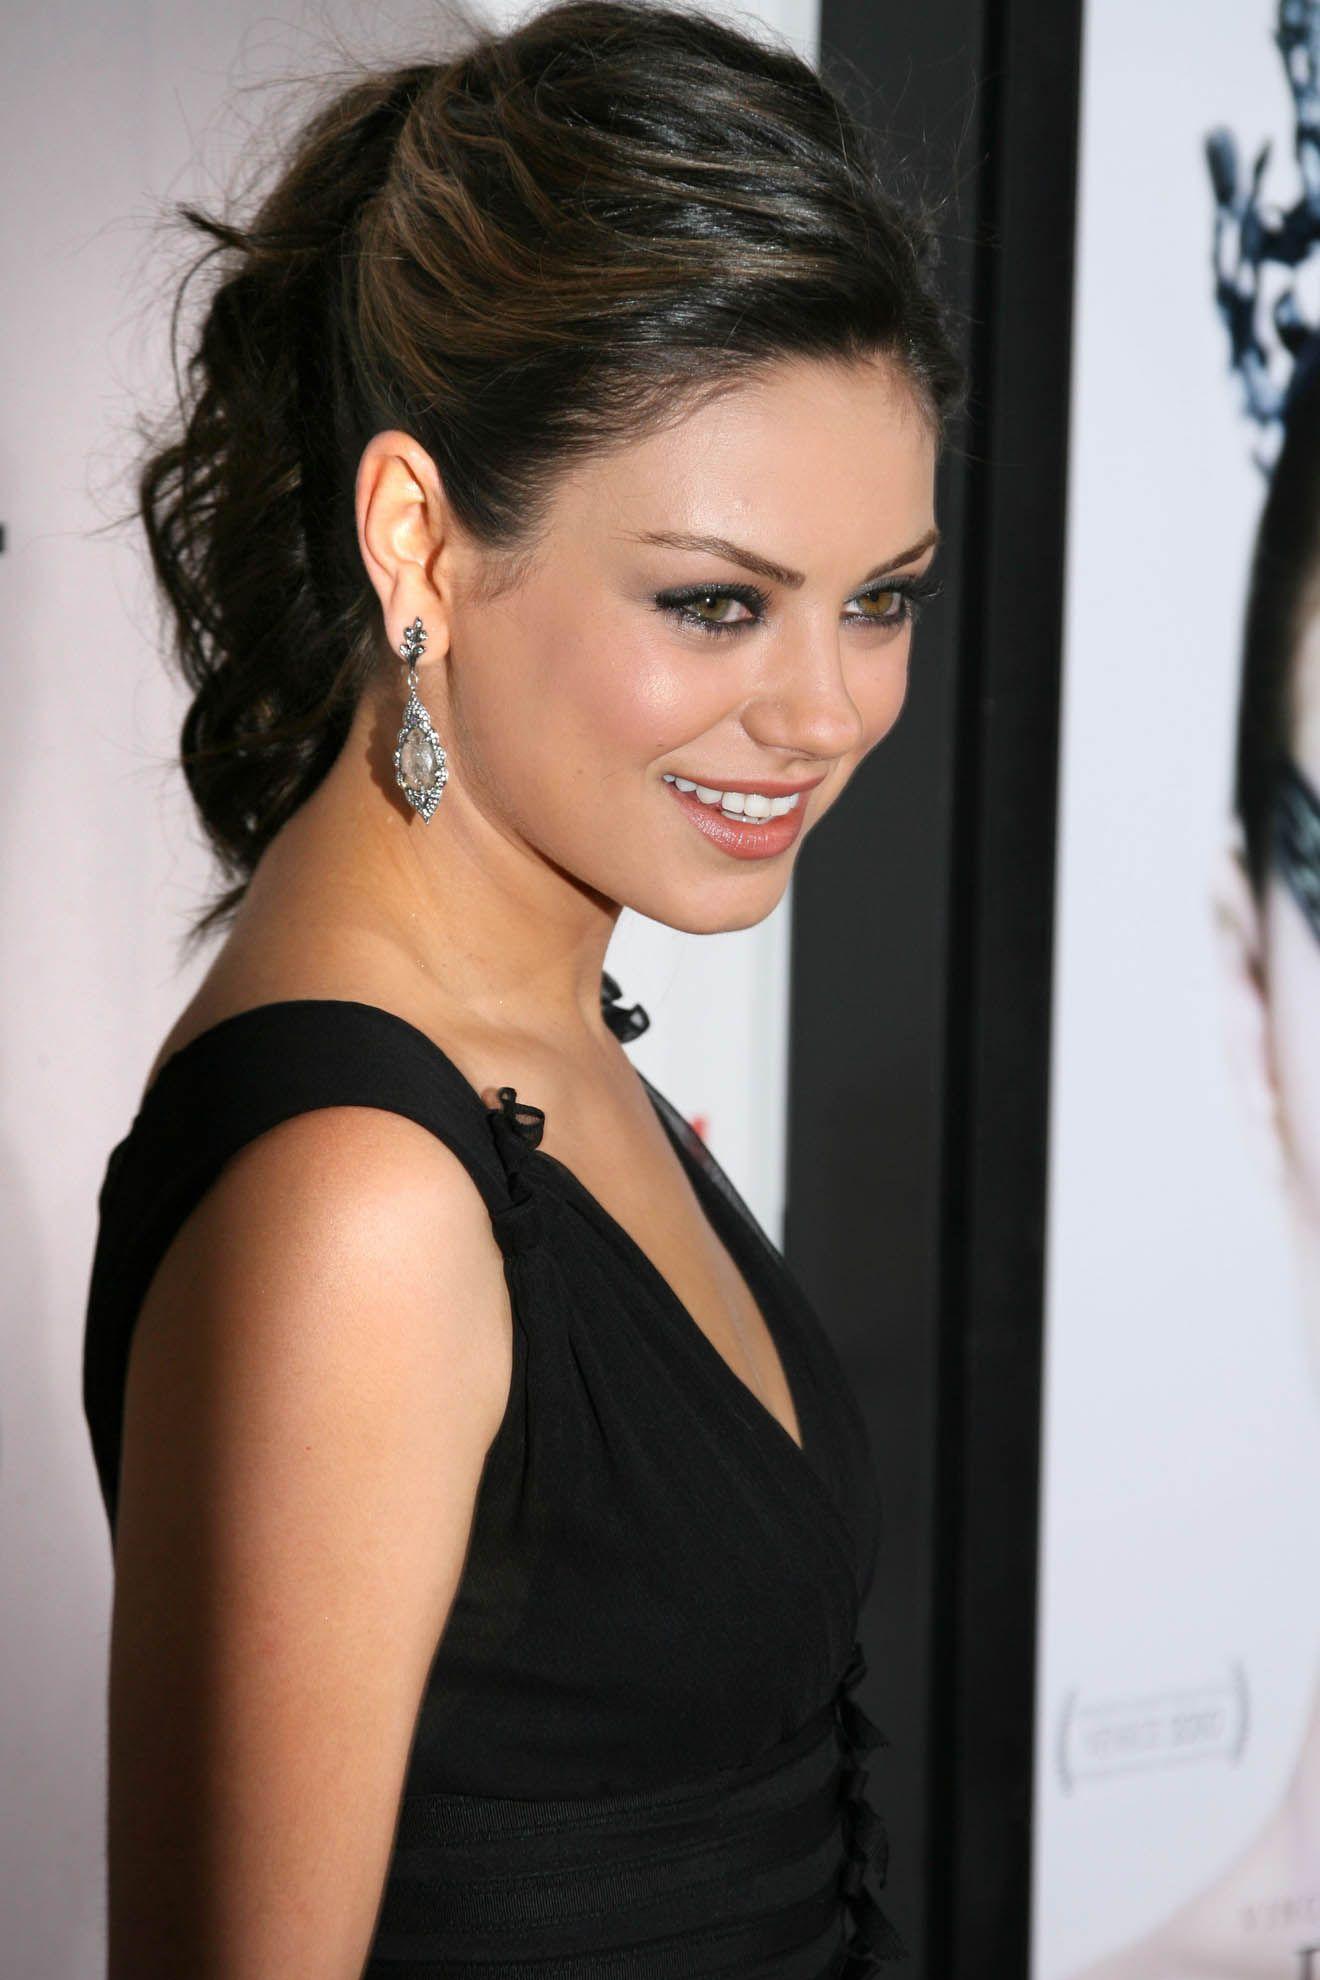 Mila kunis wedding dress  Mila Kunis  uc  Pinterest  Mila kunis Actresses and Celebrity list